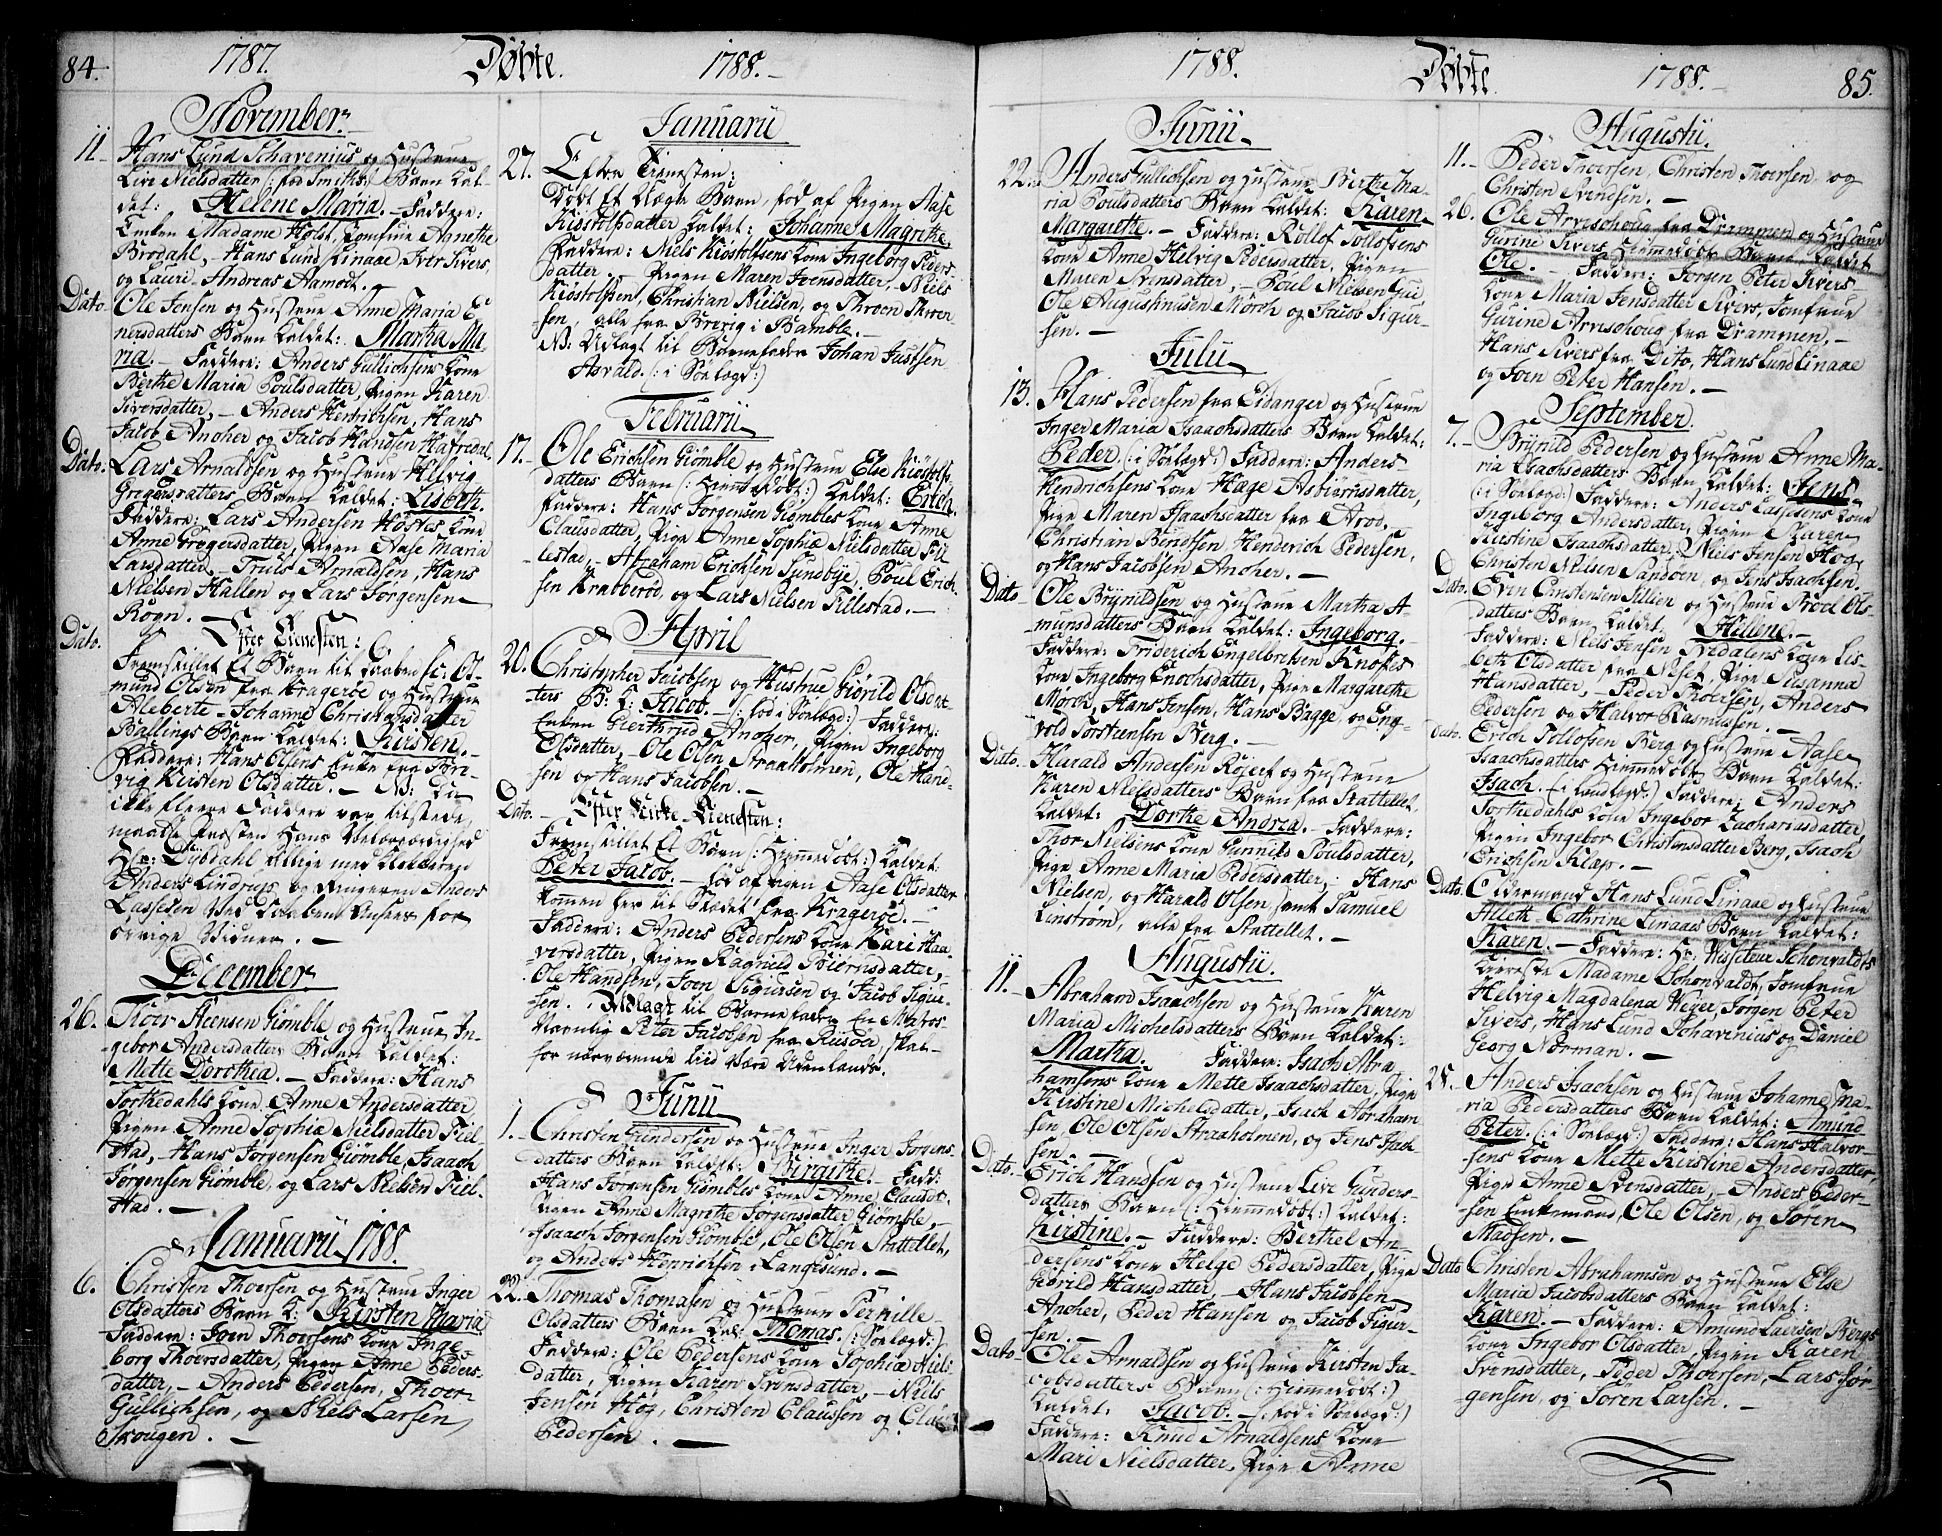 SAKO, Bamble kirkebøker, F/Fa/L0002: Ministerialbok nr. I 2, 1775-1814, s. 84-85